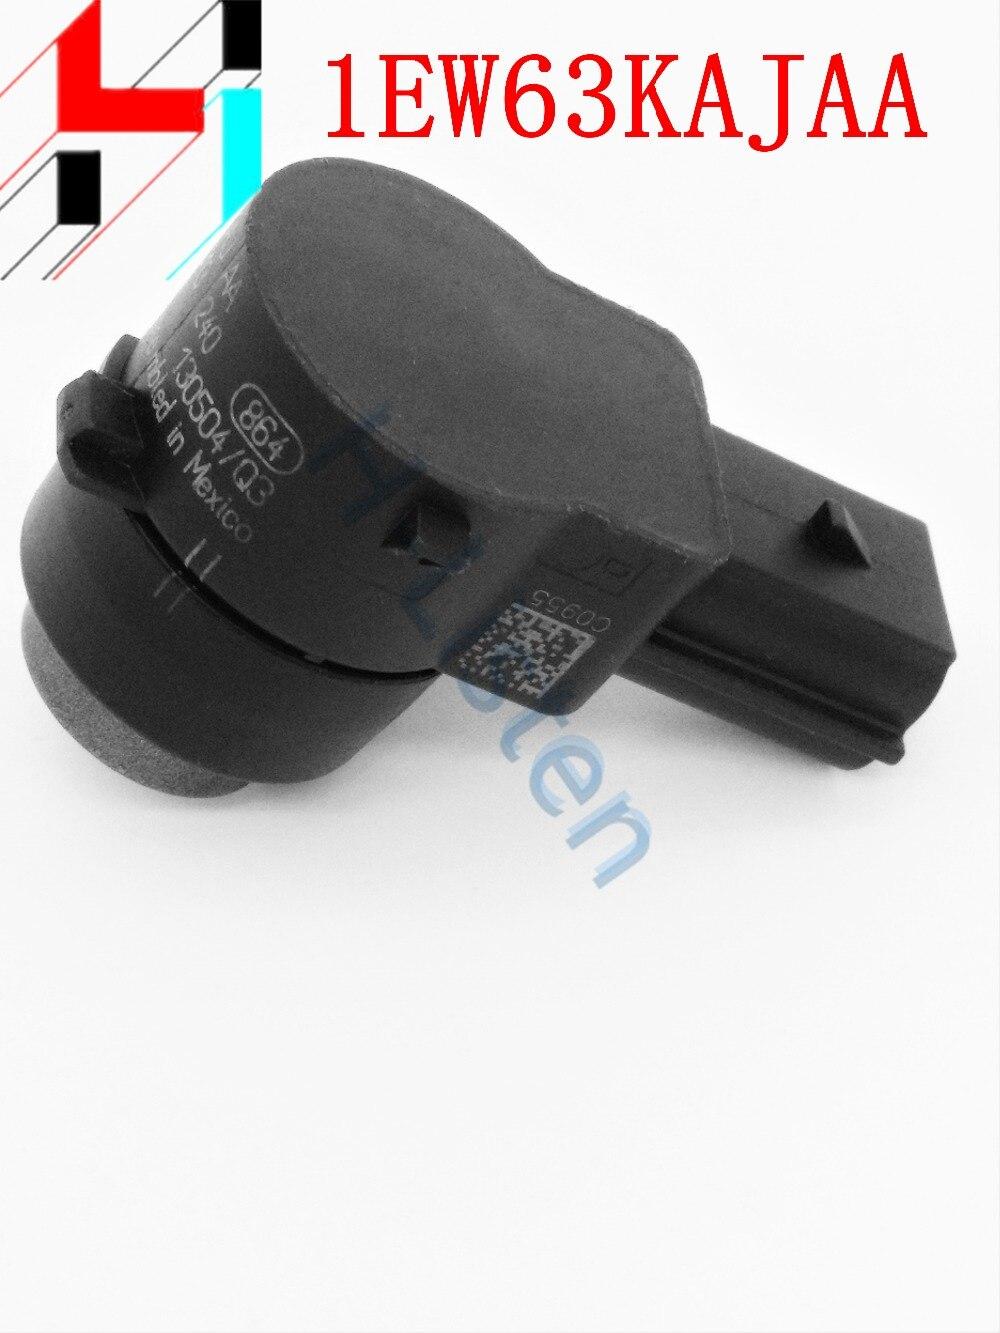 1EW63KAJAA 0263013240 PDC Parking Distance Control Aid Sensor For Ram 1500 2500 3500  1EW63KAJ AA|parking distanc controll|parking aid sensor|parking sensor - title=